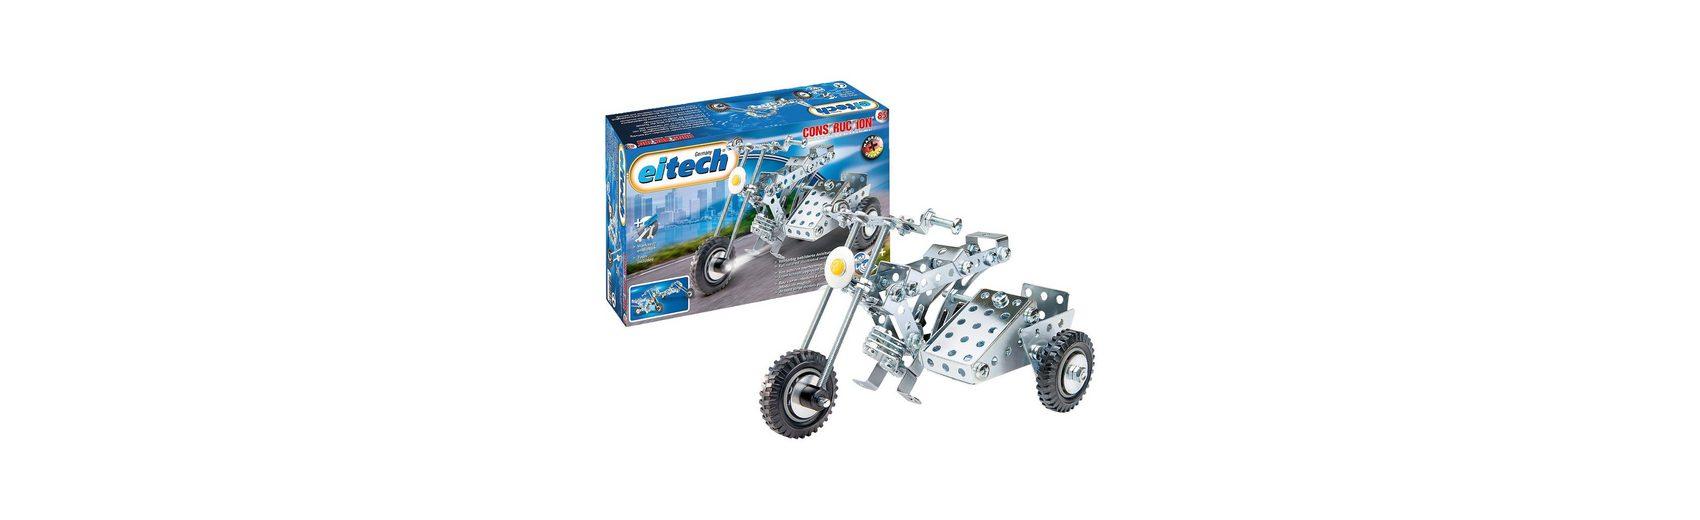 Eitech Metallbaukasten Motorrad-Variationen